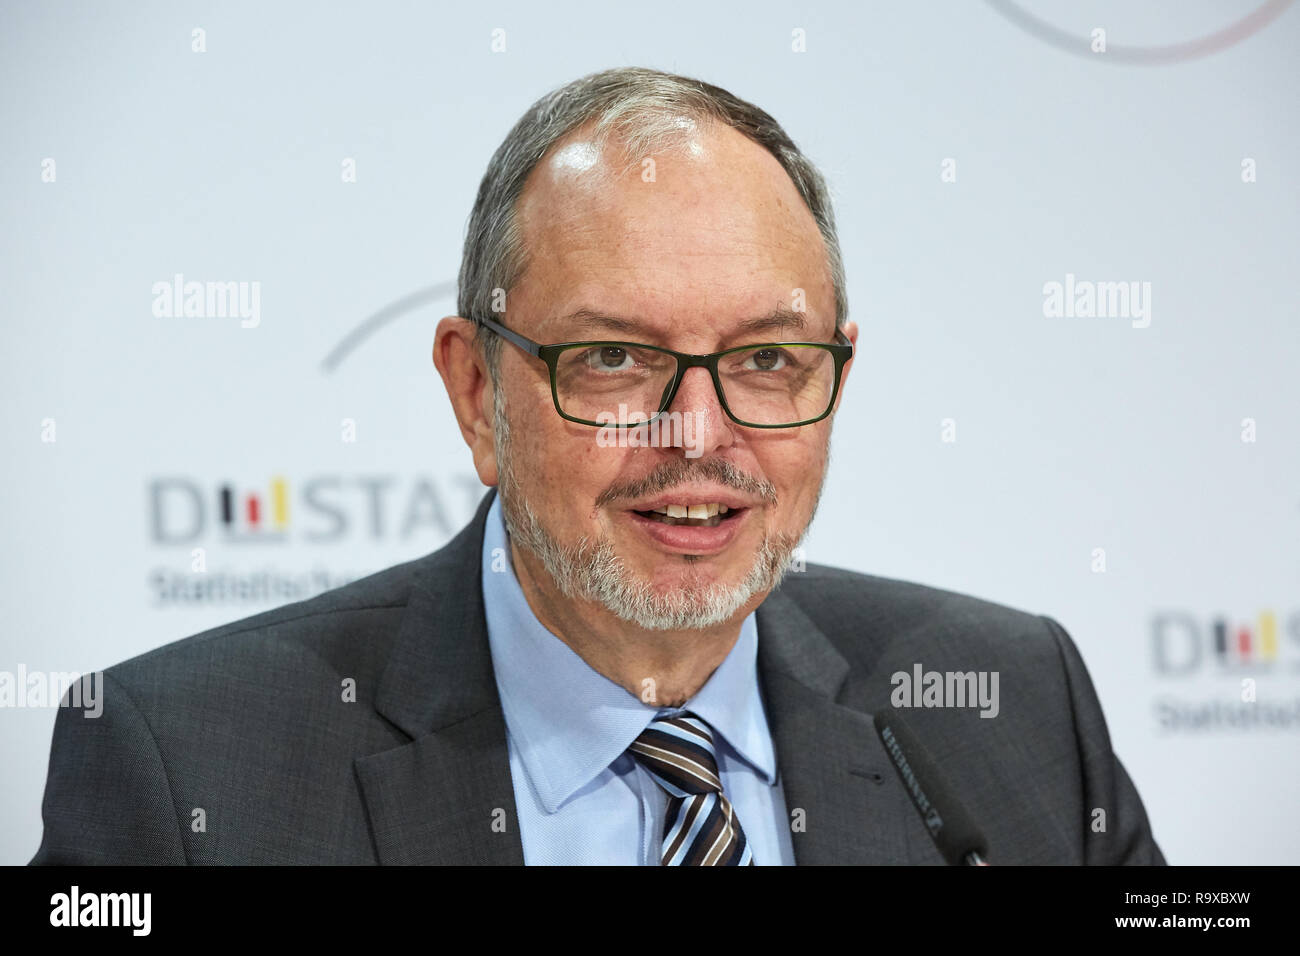 18.10.2018, Berlin, Deutschland - Dr. Georg Thiel -Praesident des Statistischen Bundesamtes. 00R181018D030 [MODEL RELEASE: NO, PROPERTY RELEASE: NO (c - Stock Image